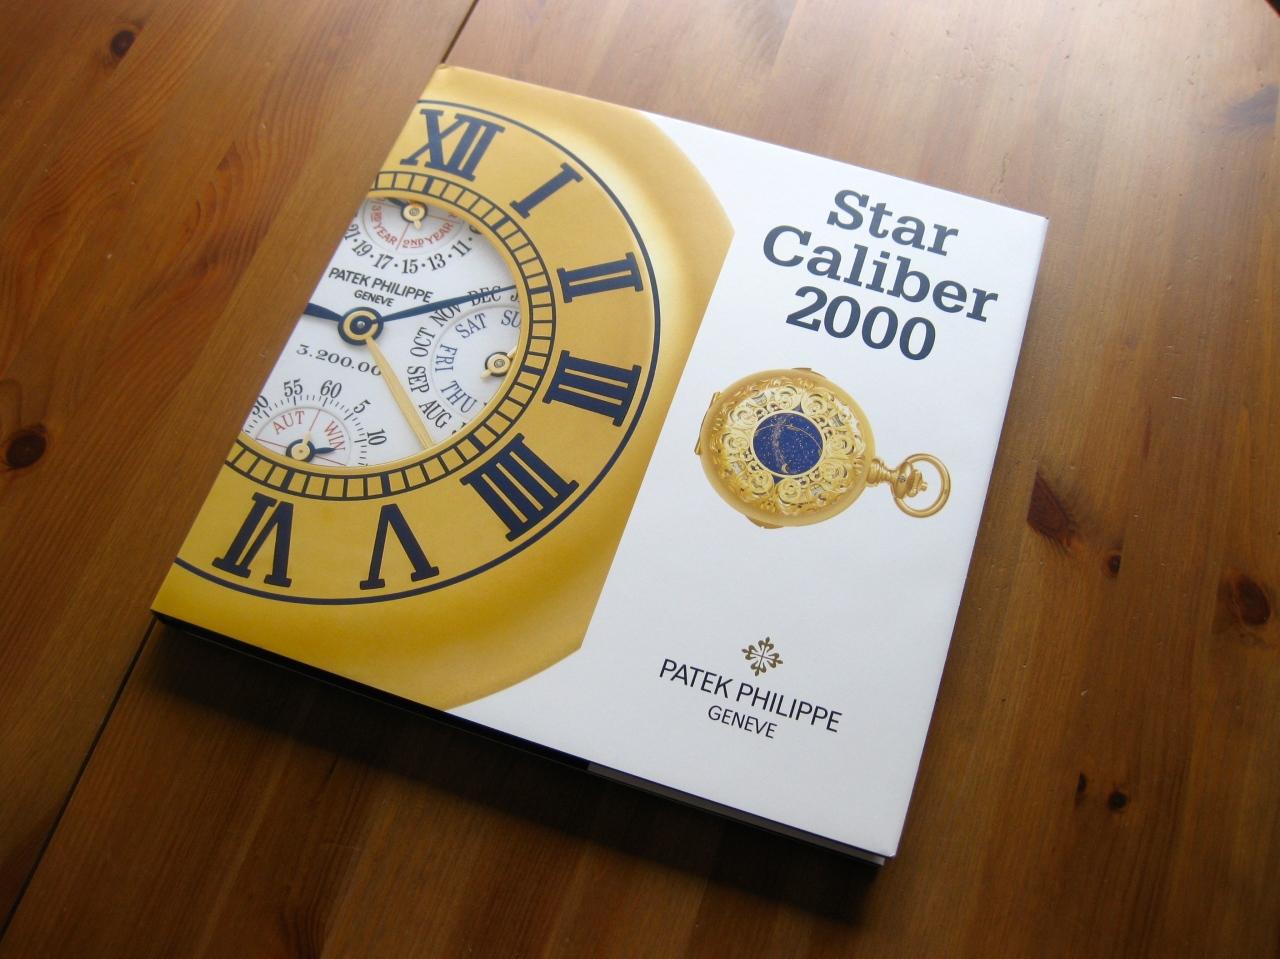 Patek Philippe – Star Caliber2000